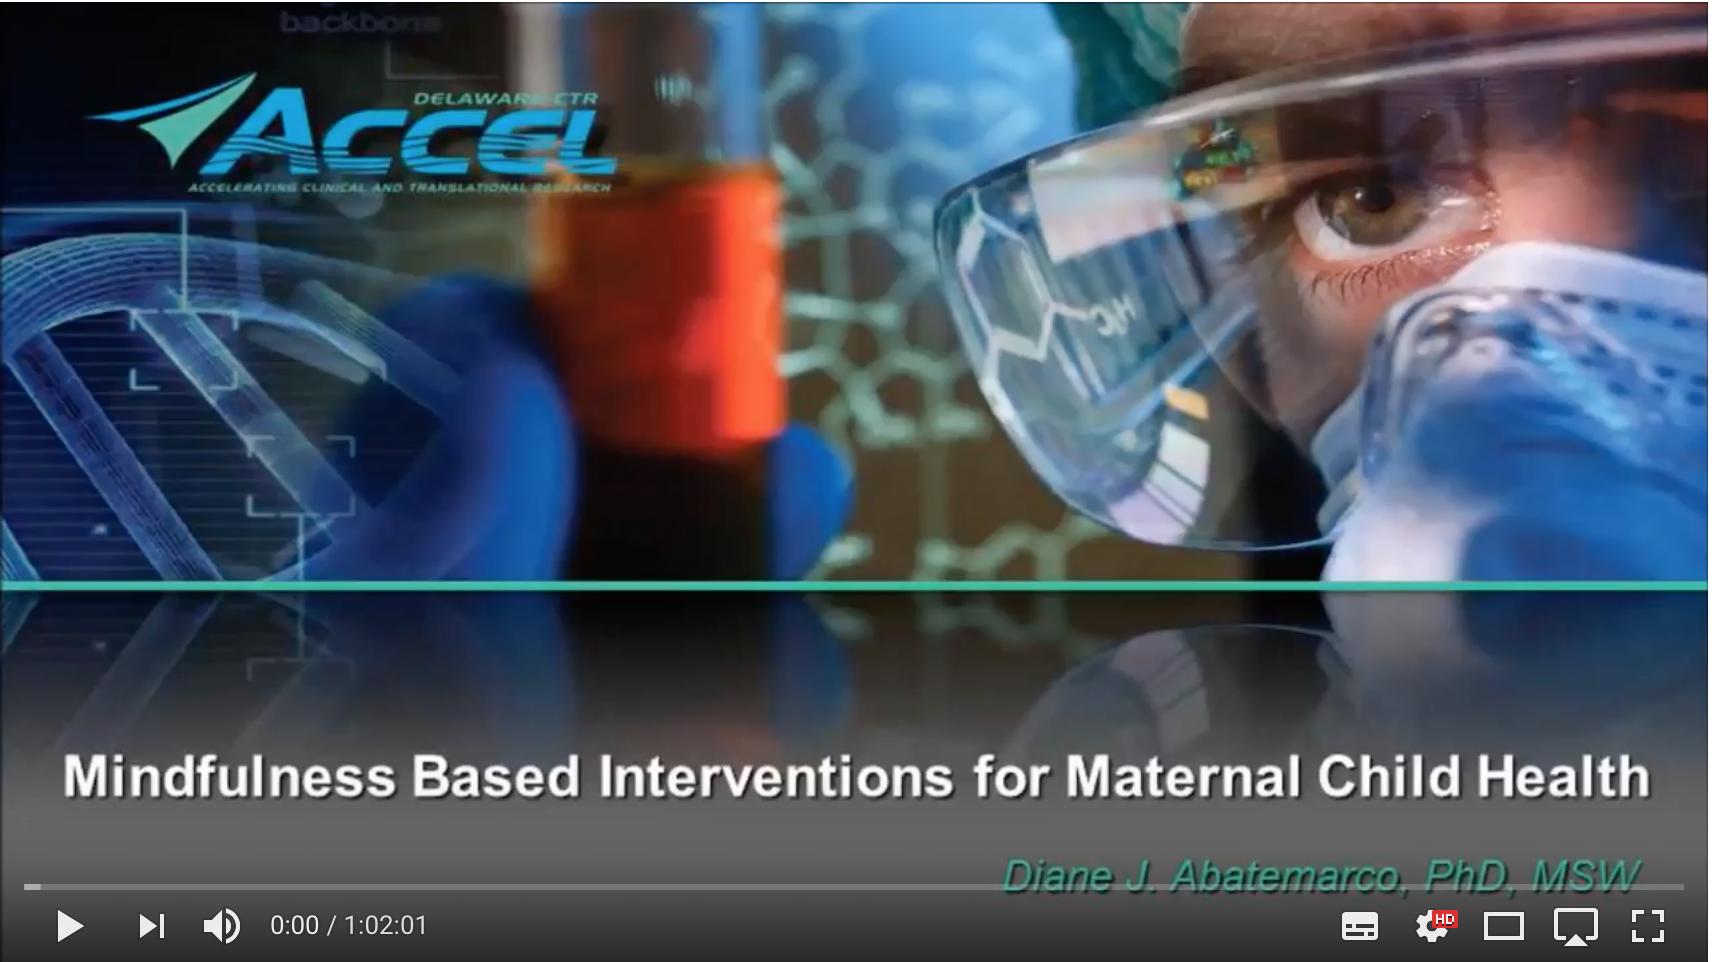 Filmtip: Mindfulness Based Interventions for Maternal Child Health